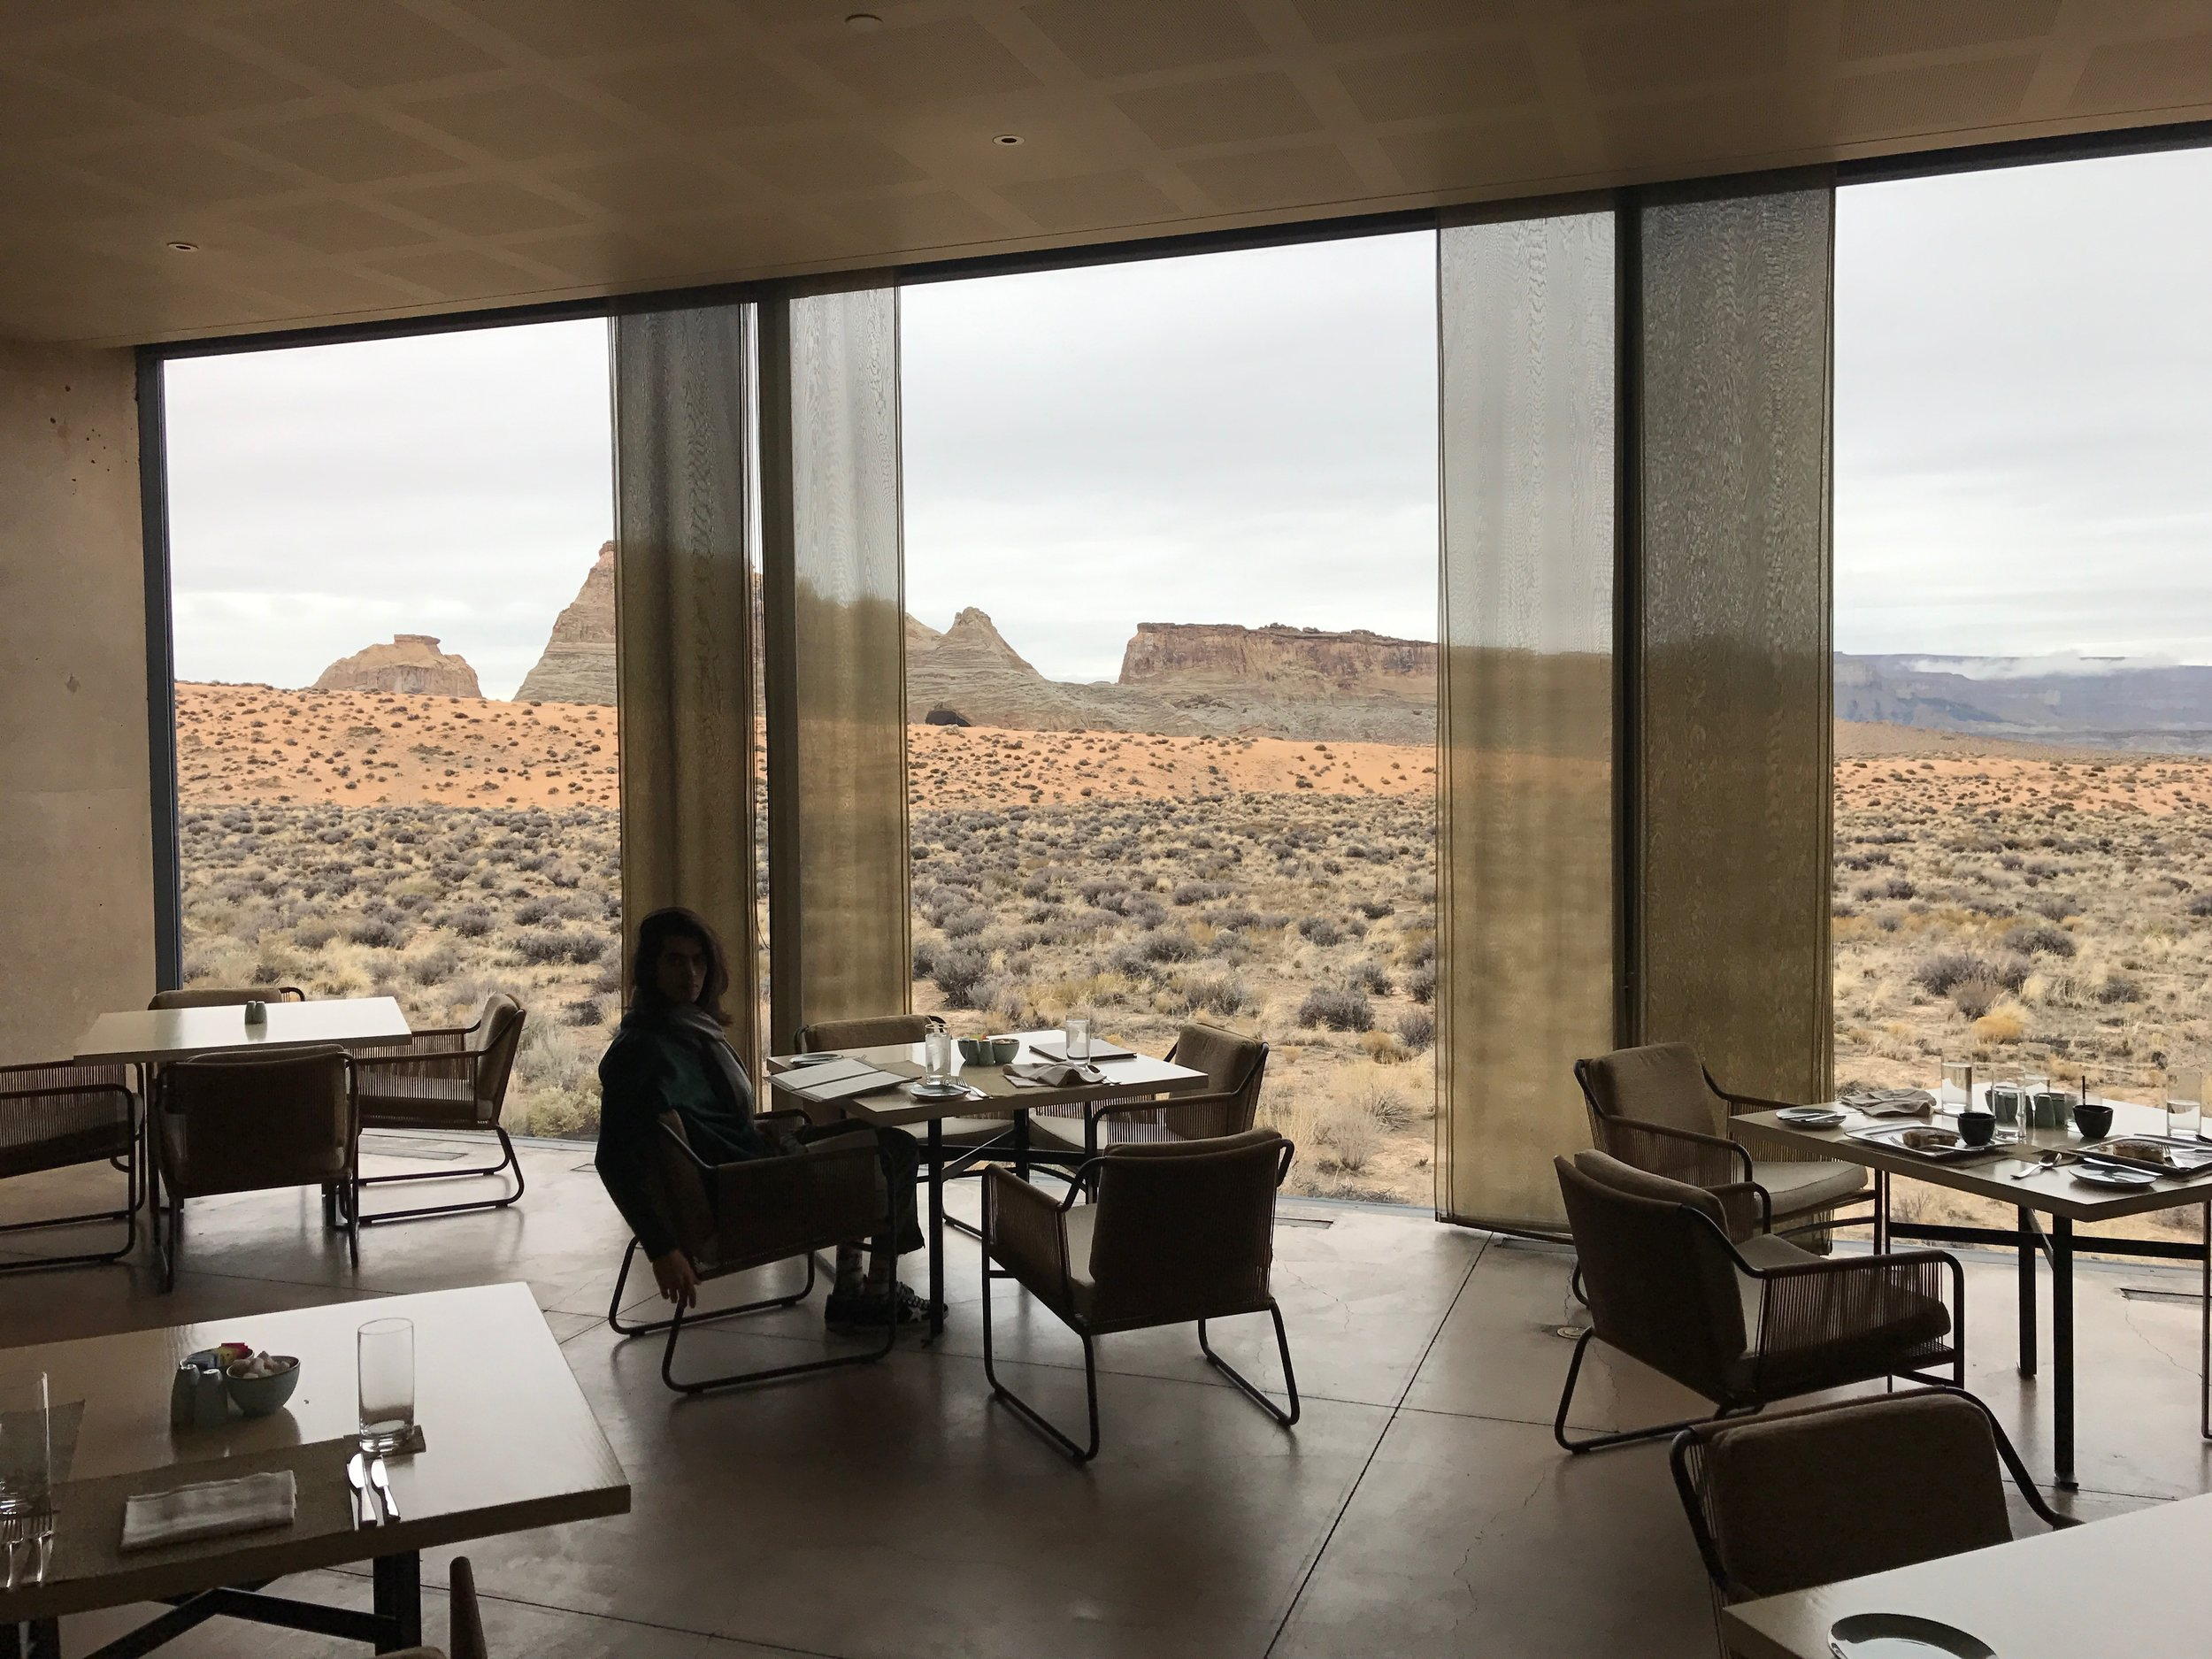 Dining Room at the Amangiri Hotel, Utah, USA - Roland Emmerich - 3 Days*